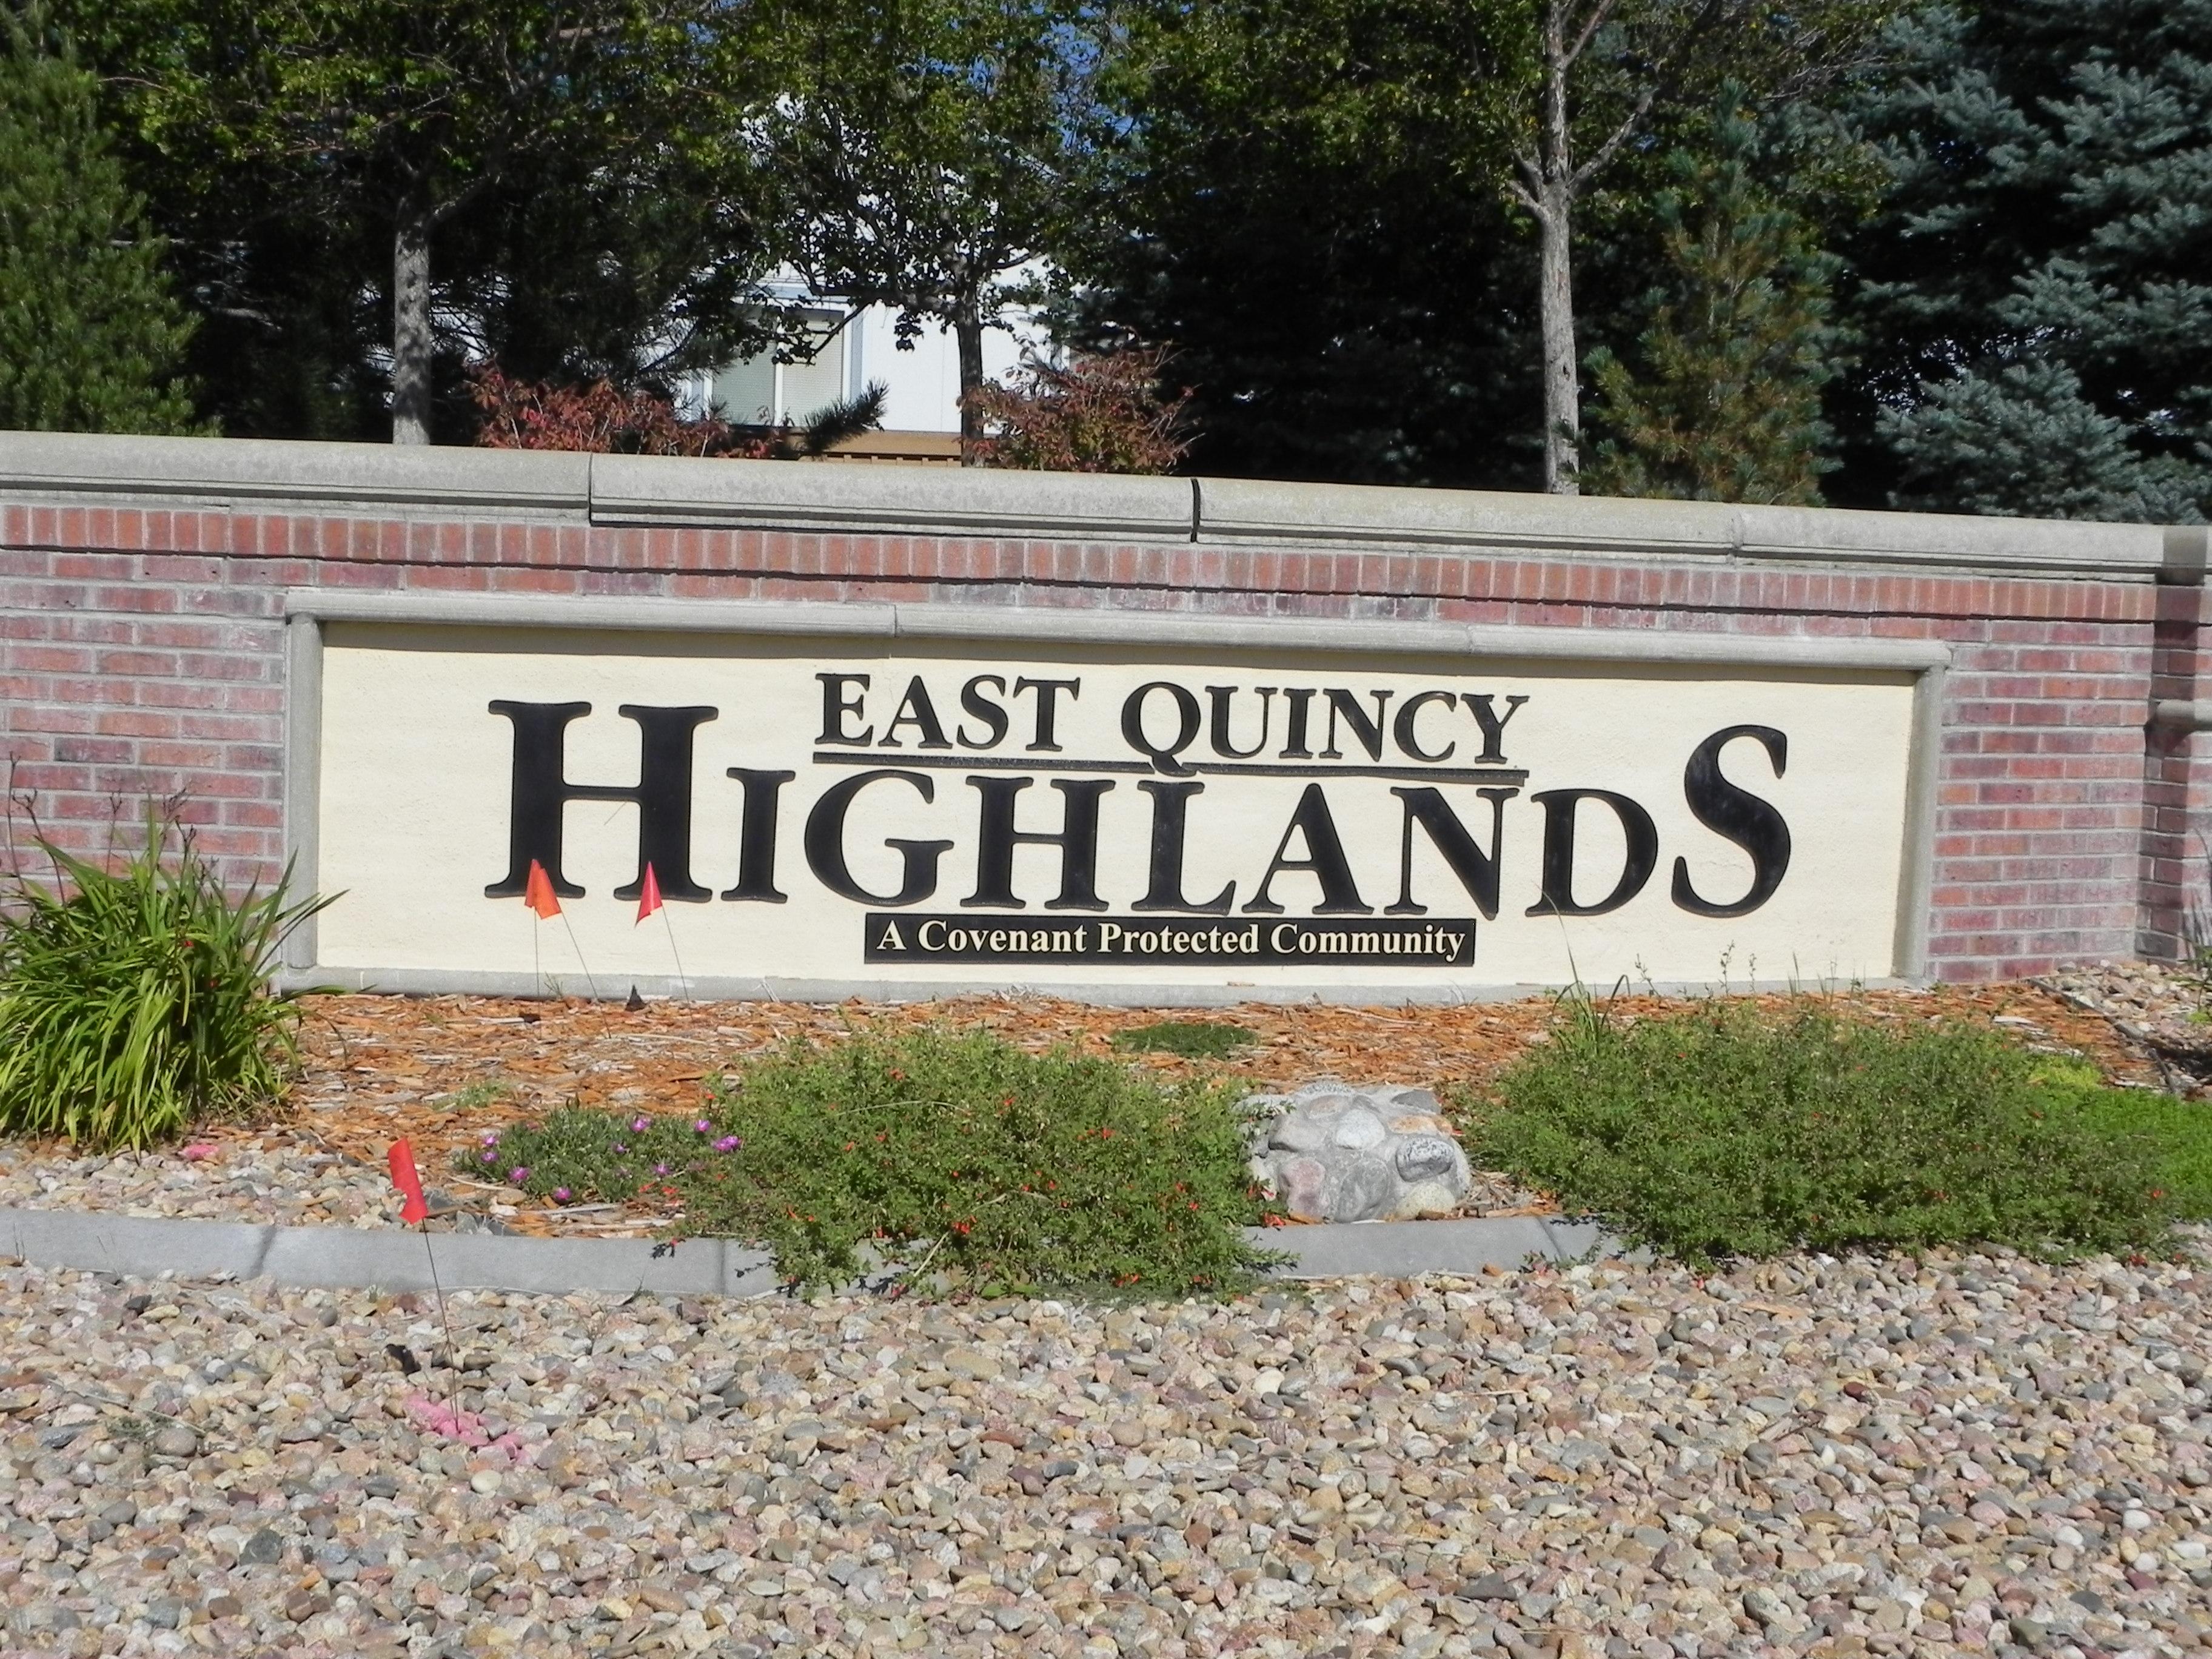 East Quincy Highlands